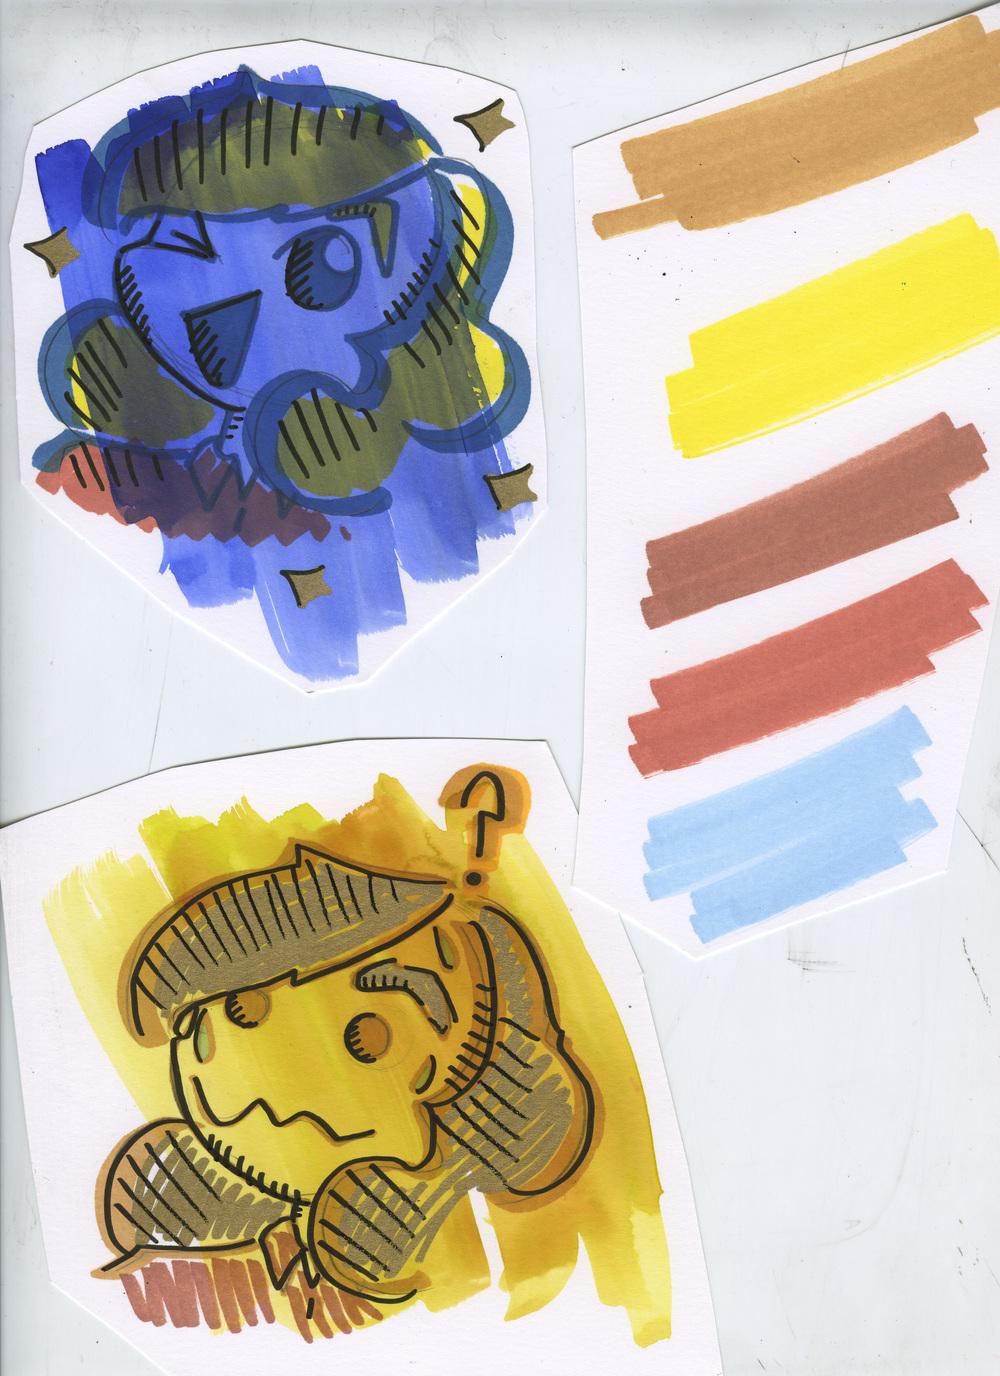 2016. Sketch for the Music Venue project. Marker, Dr. Marten's dyes, Paint marker.